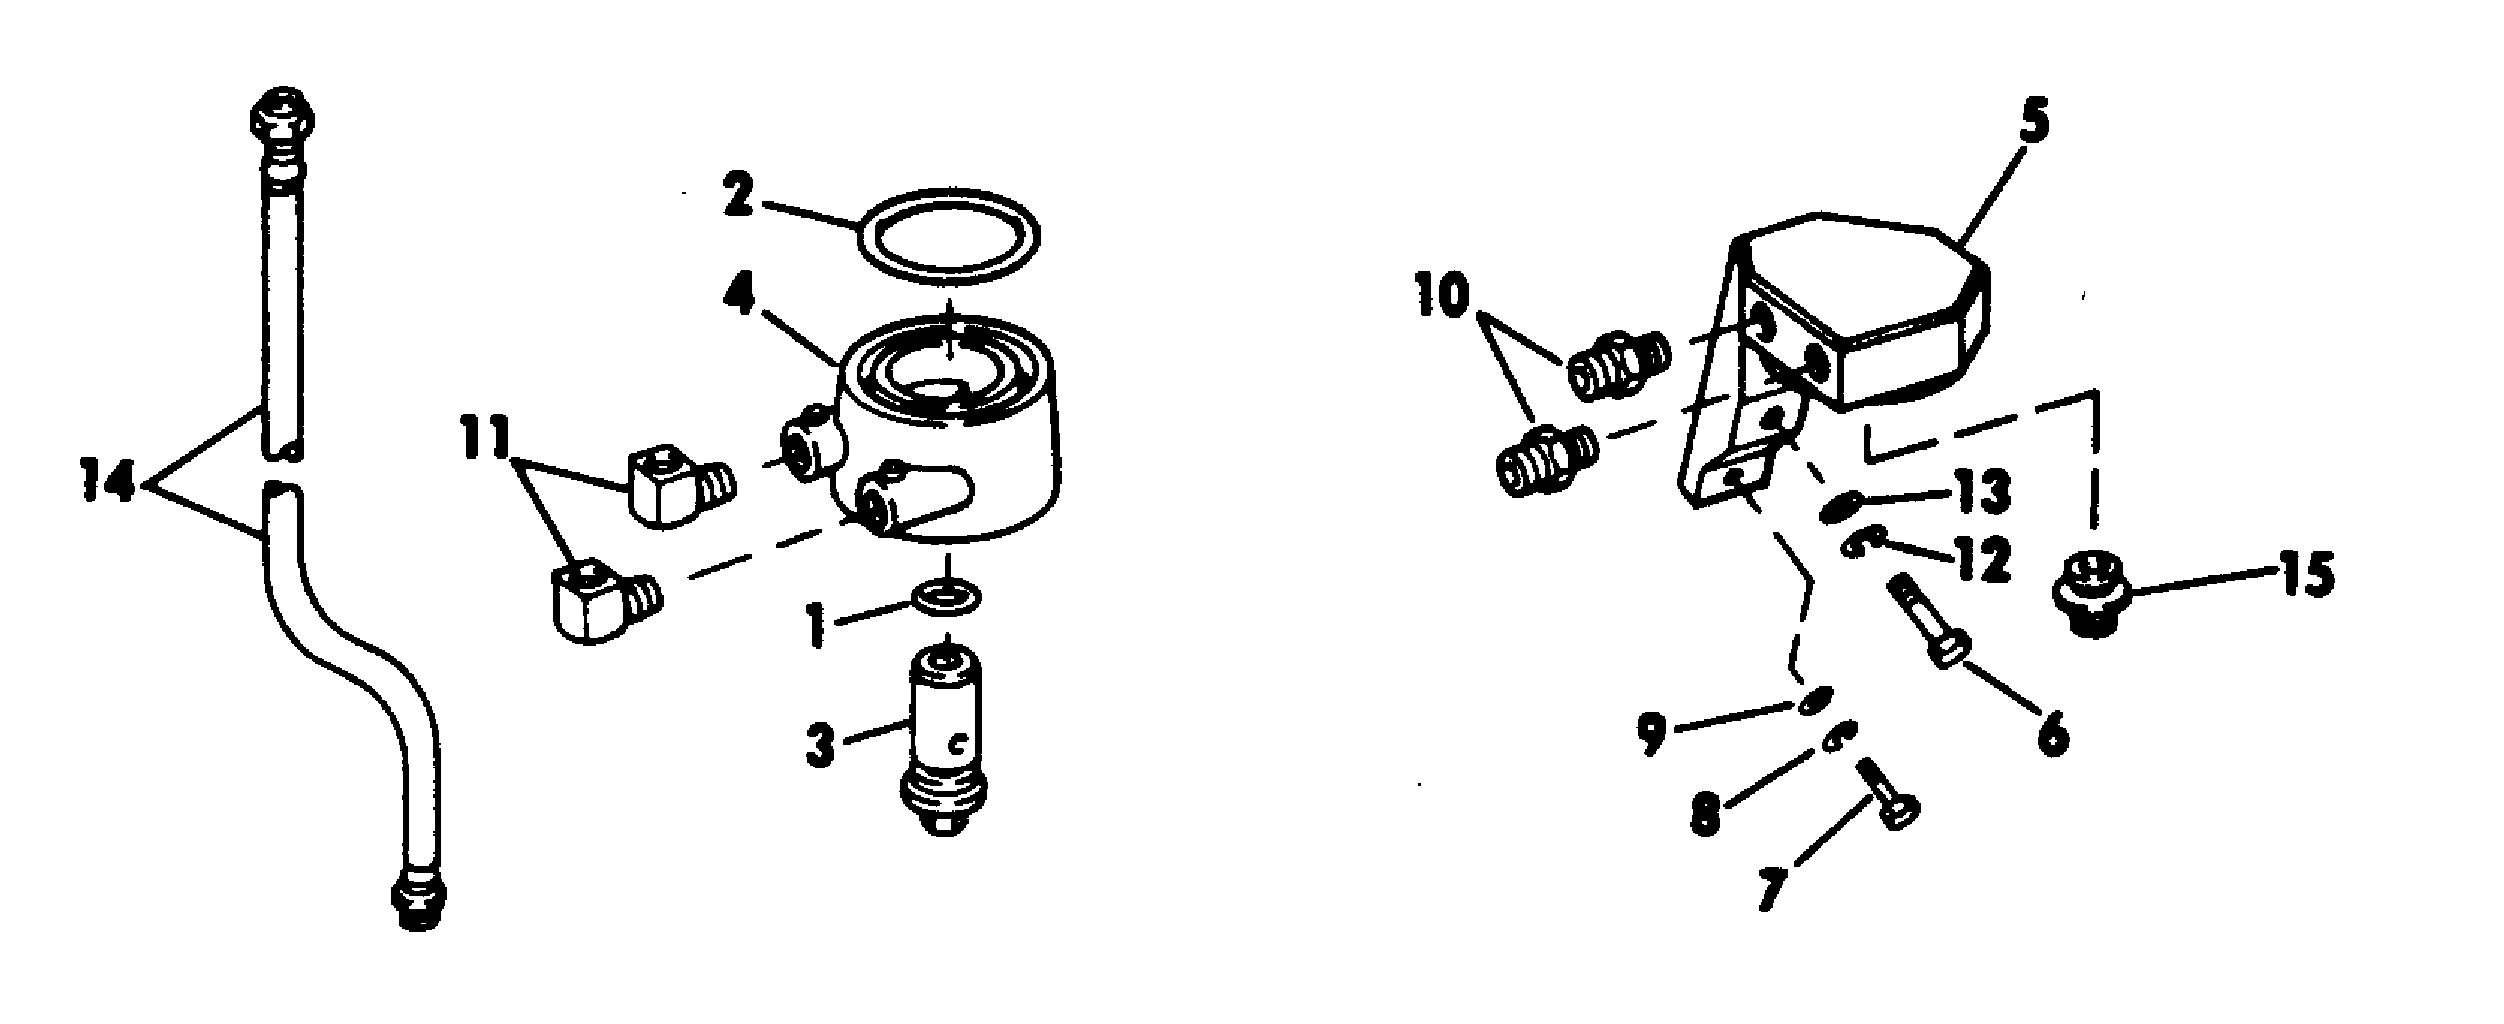 Remote Oil Filter Kit-inboard 305-350-cid Accessories for